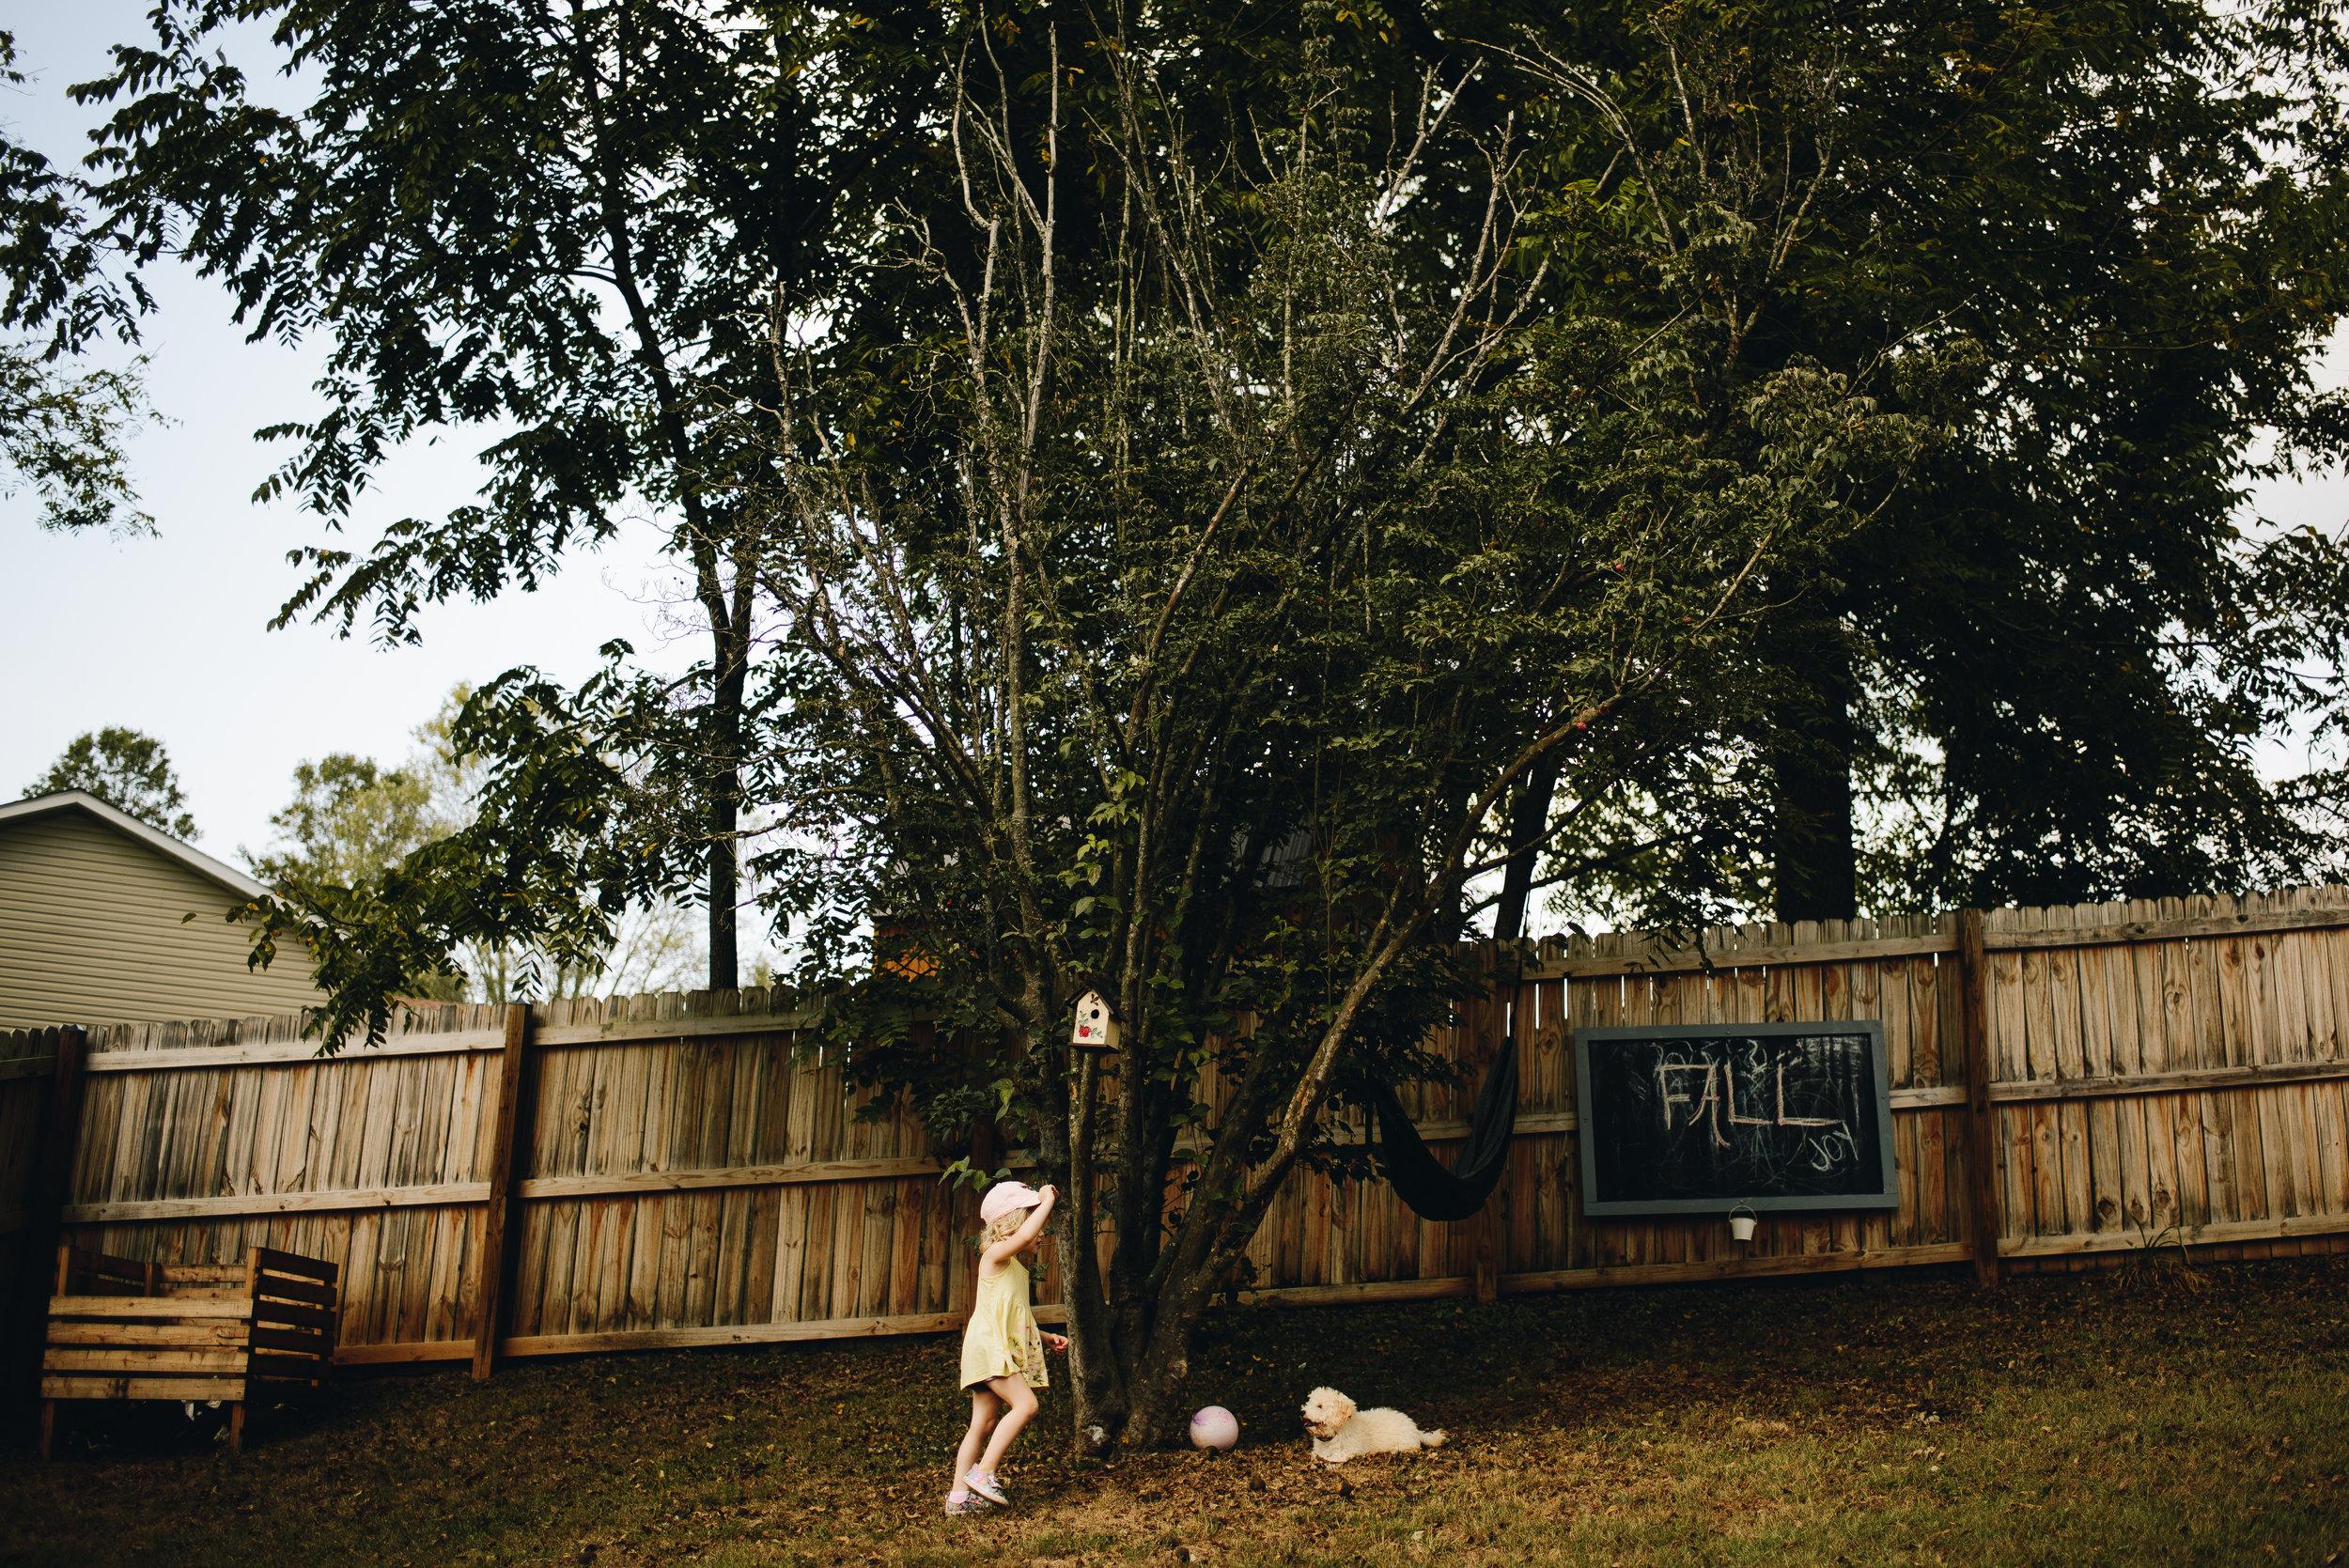 Children_Play_Backyard